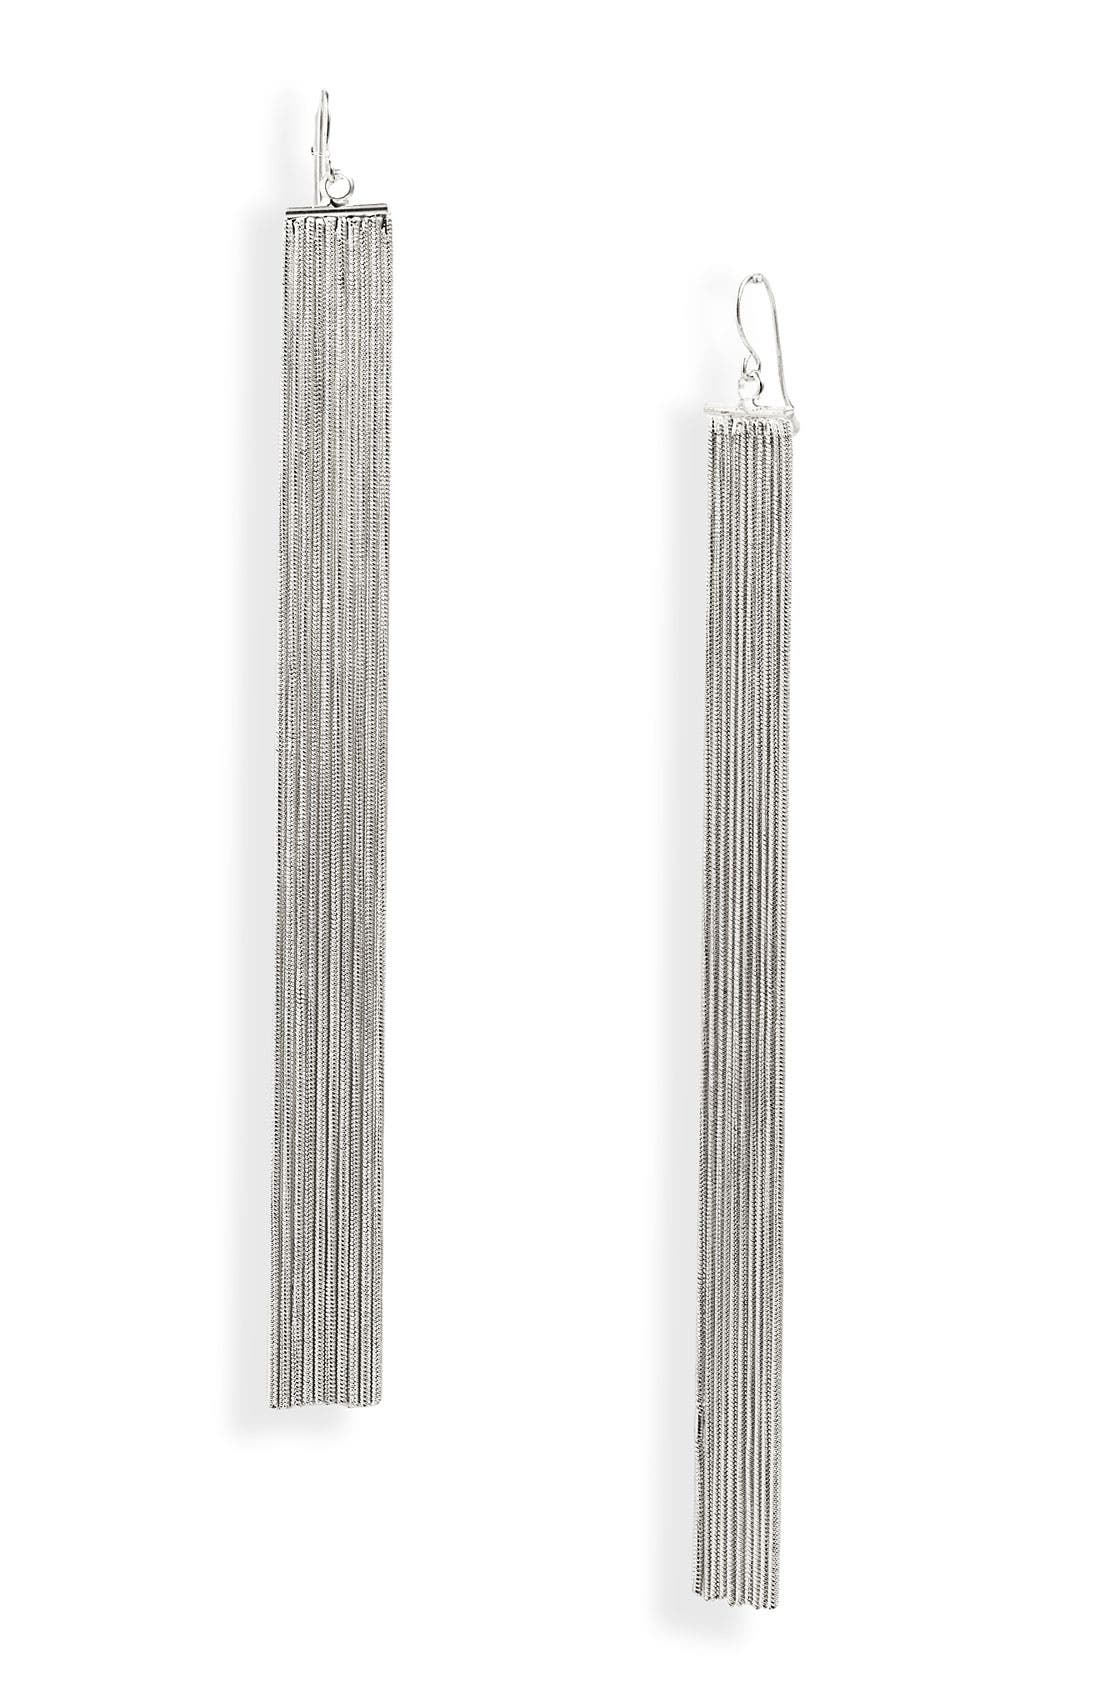 Alternate Image 1 Selected - Natasha Couture Long Fringe Earrings